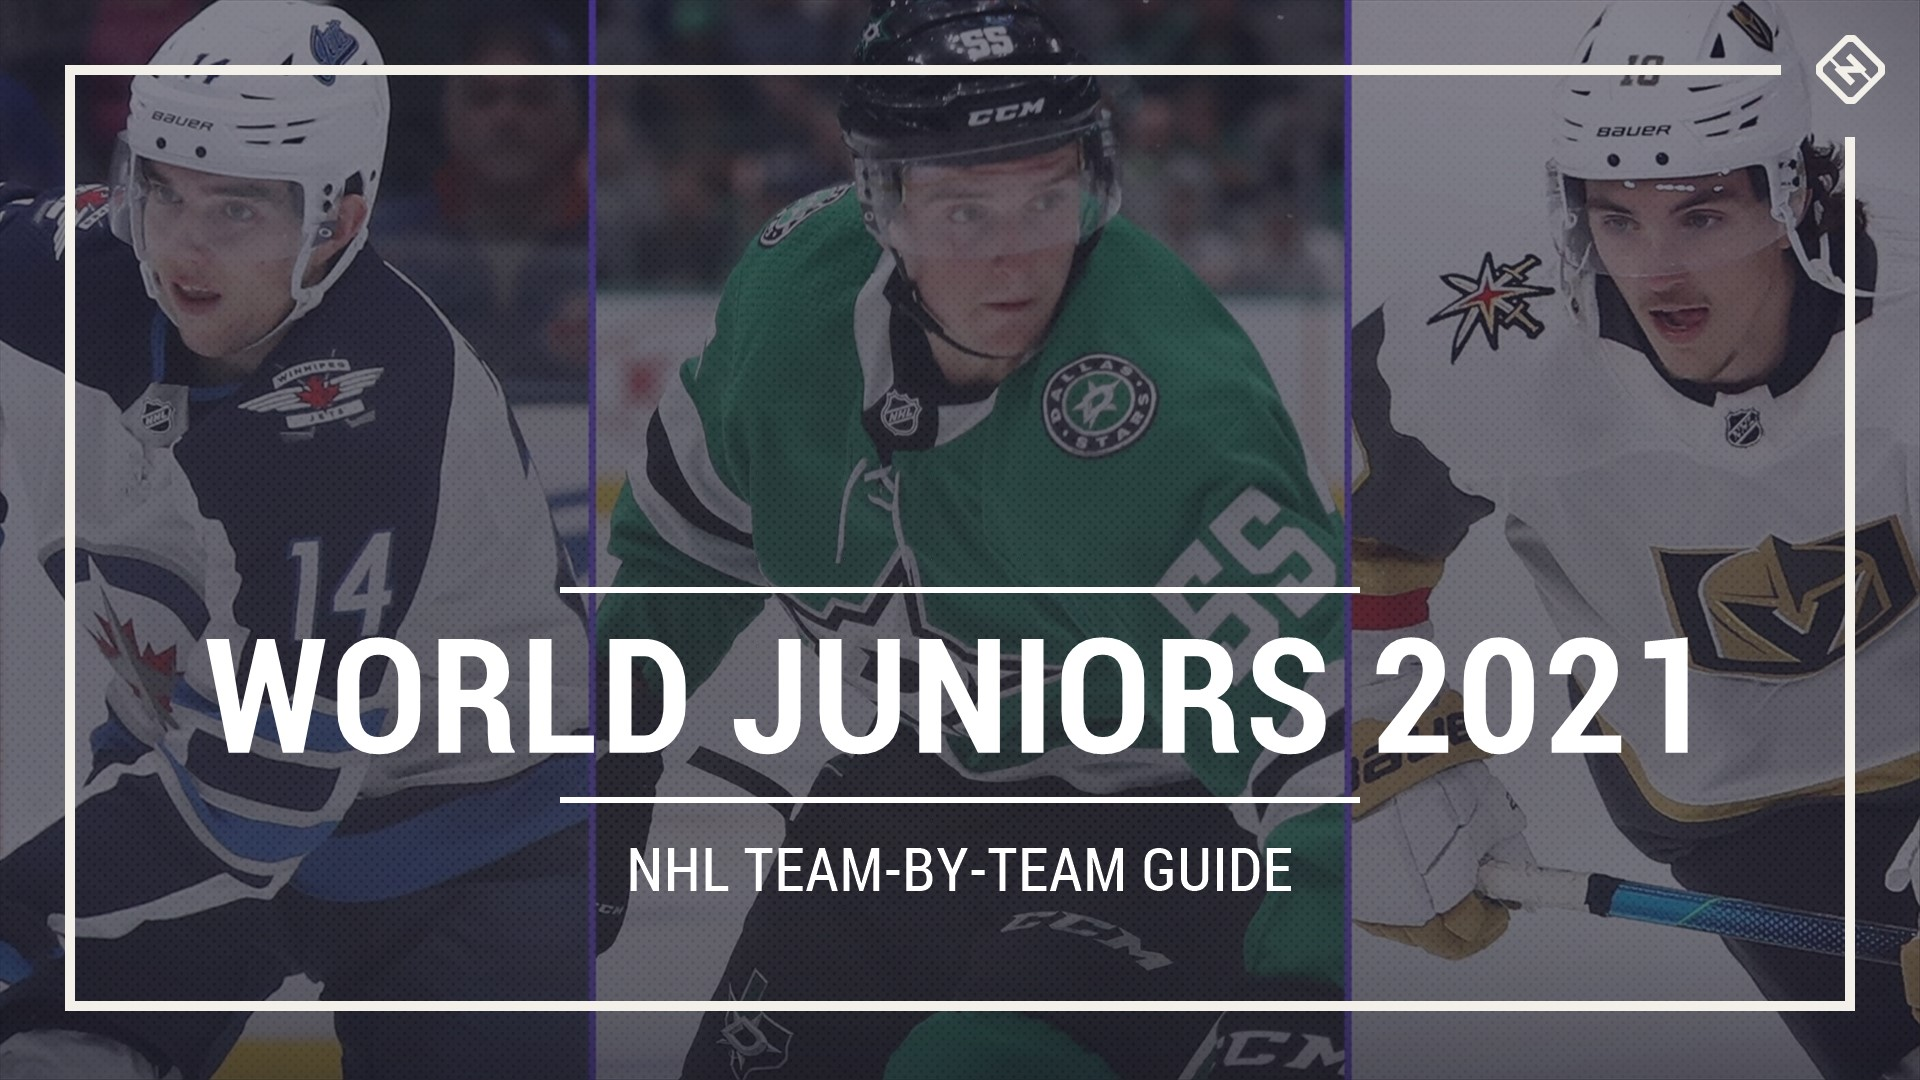 World Juniors 2021: Breakdown of every NHL teams' prospects